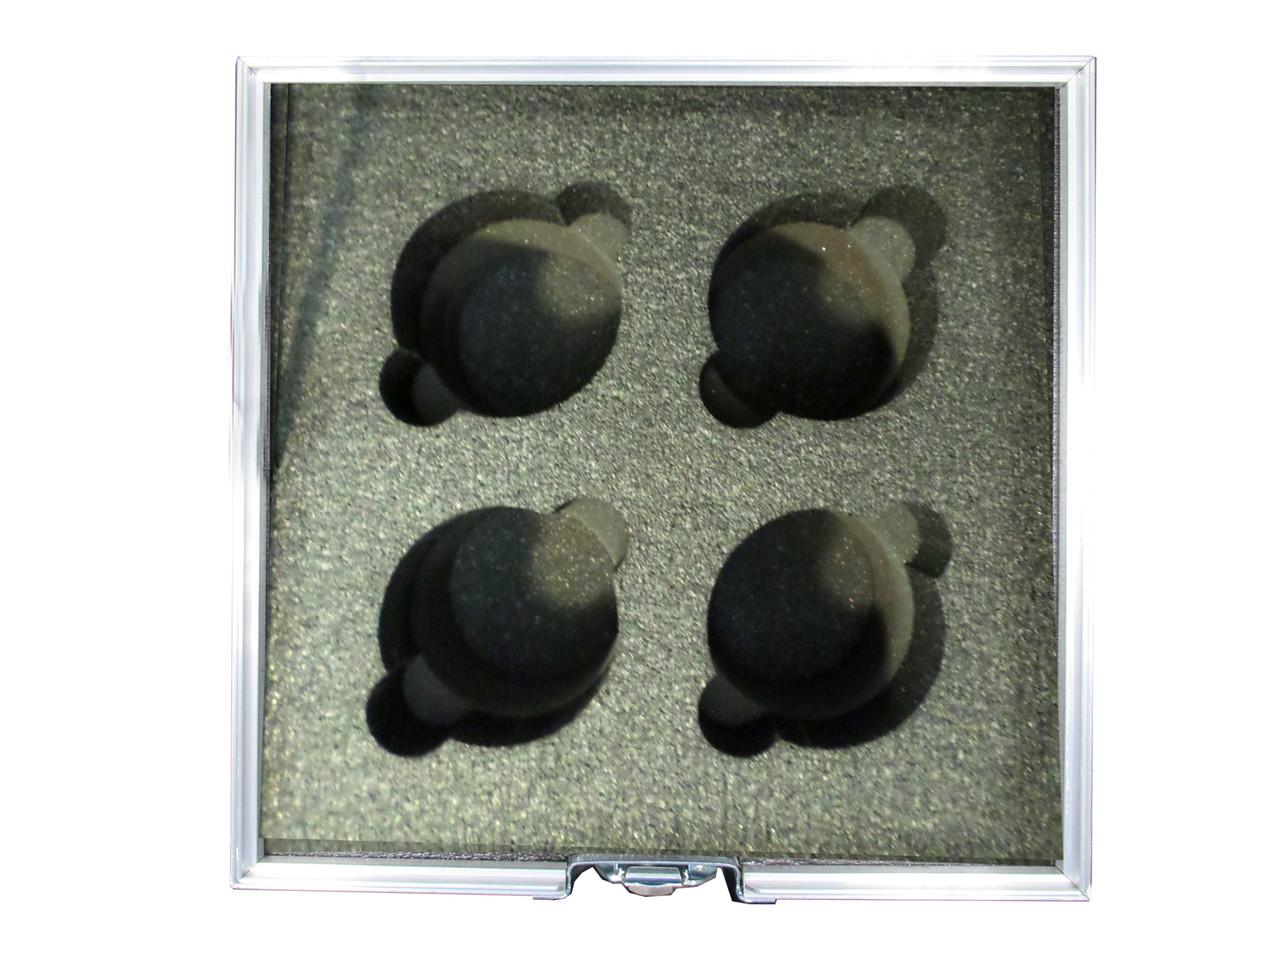 Leica Thalia Primes (4 Position Vertical Orientation)